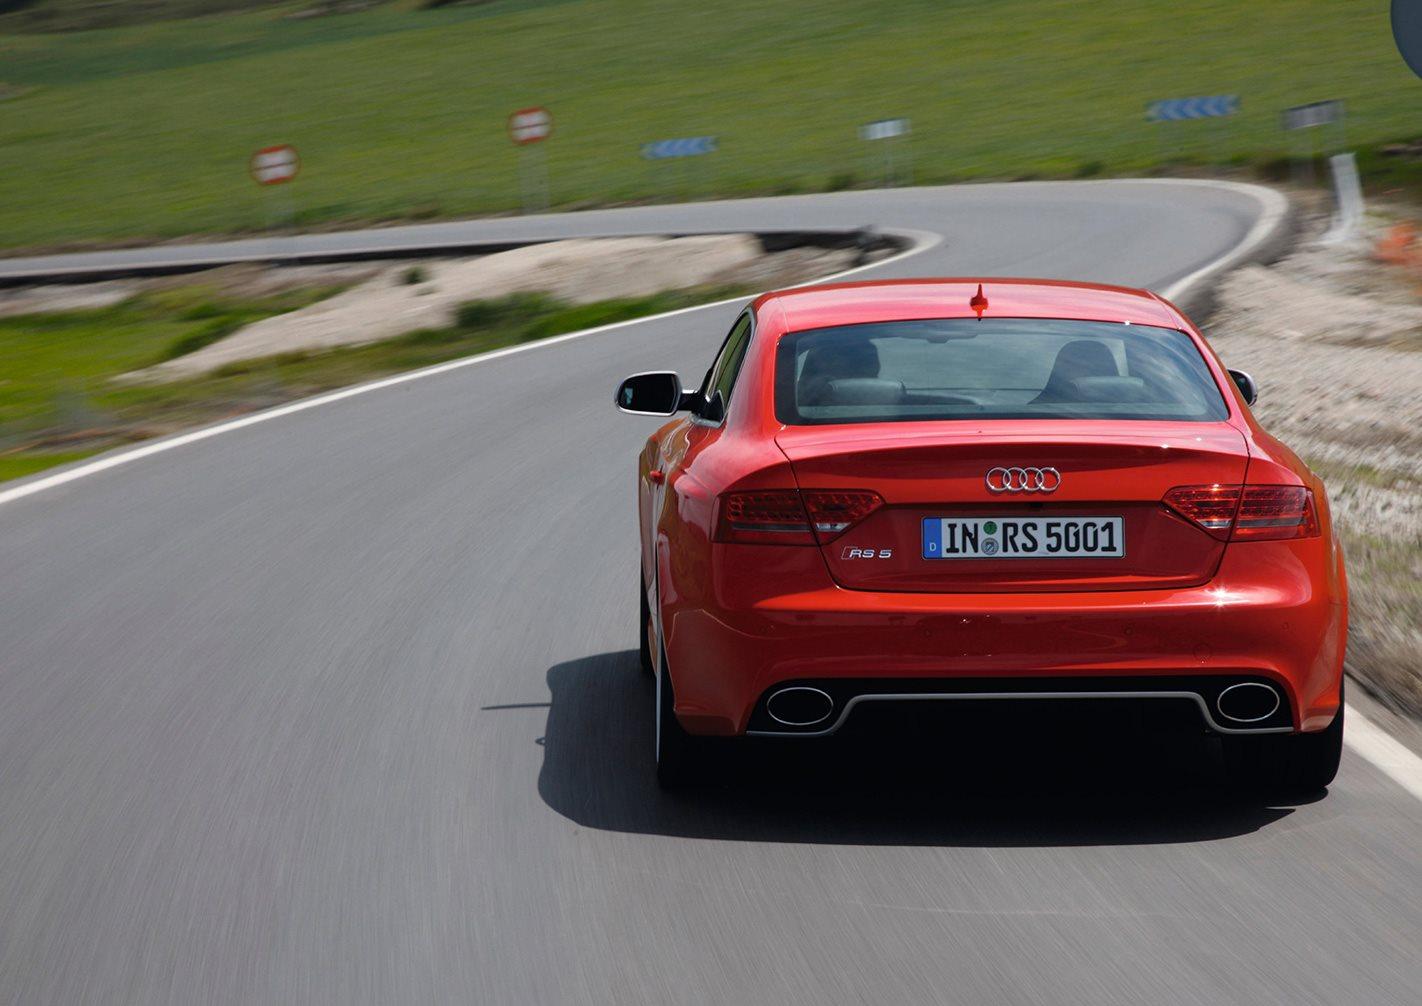 2010 Audi RS5 rear